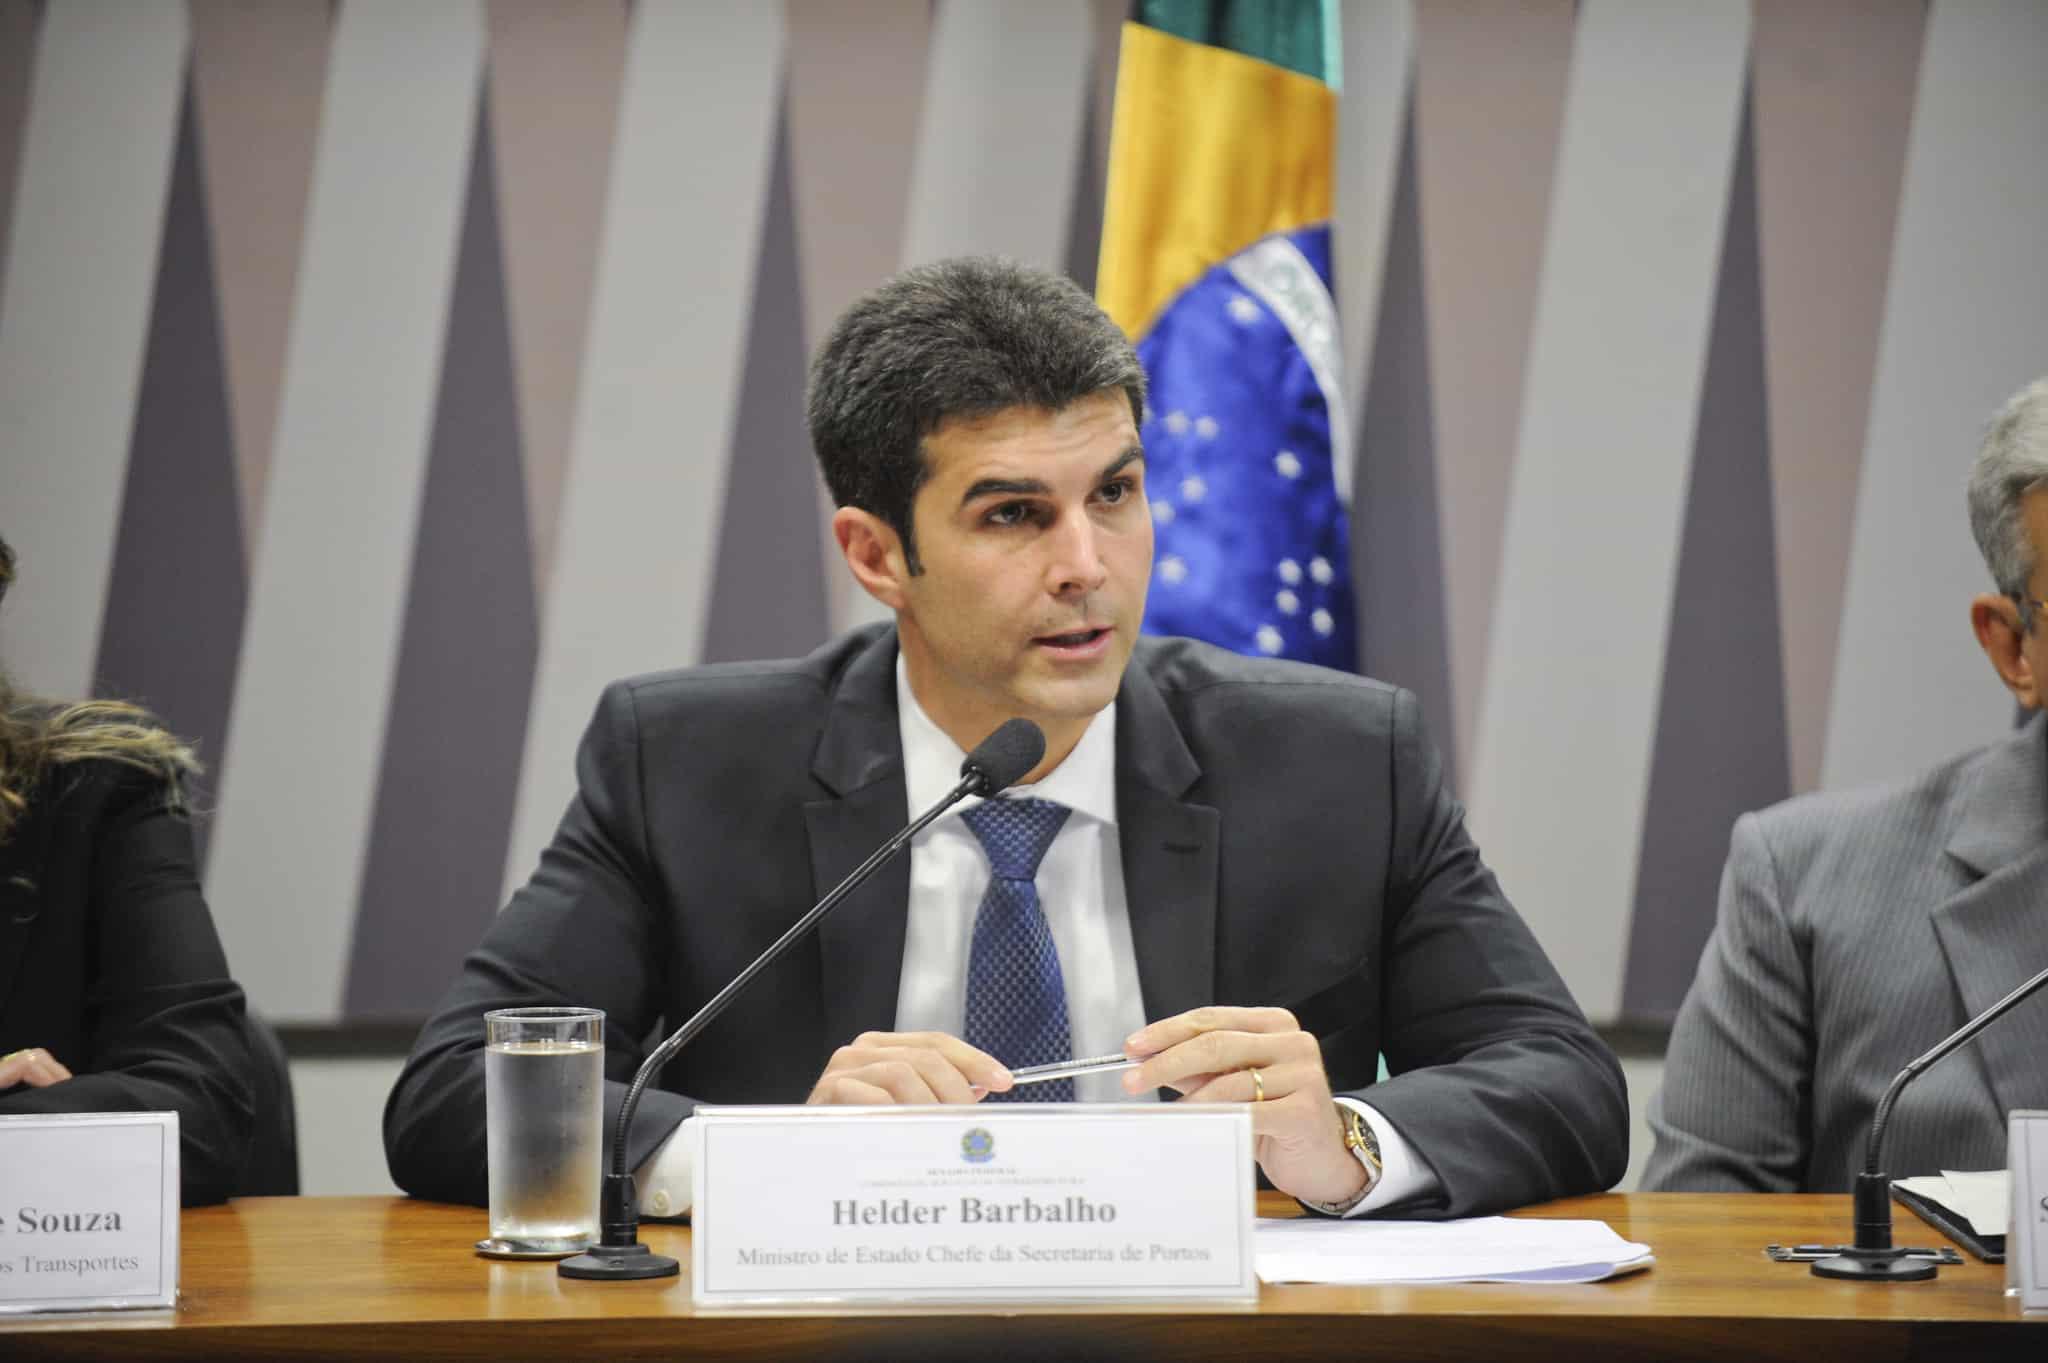 Brazil's ports minister resigns